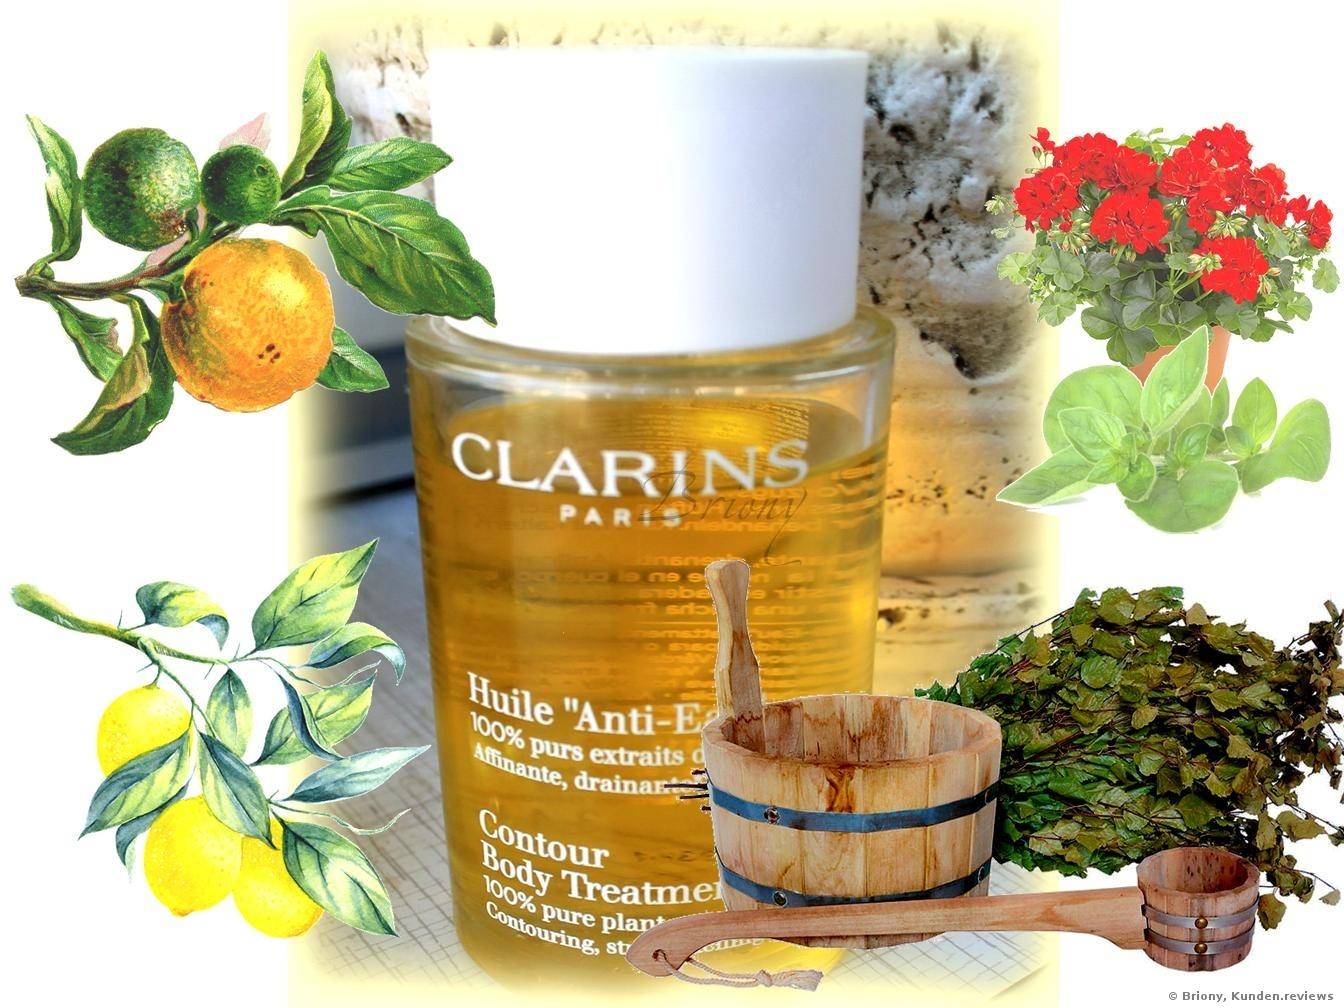 Clarins Pflanzen-Aroma-Körperpflege Huile 'Anti- Eau'